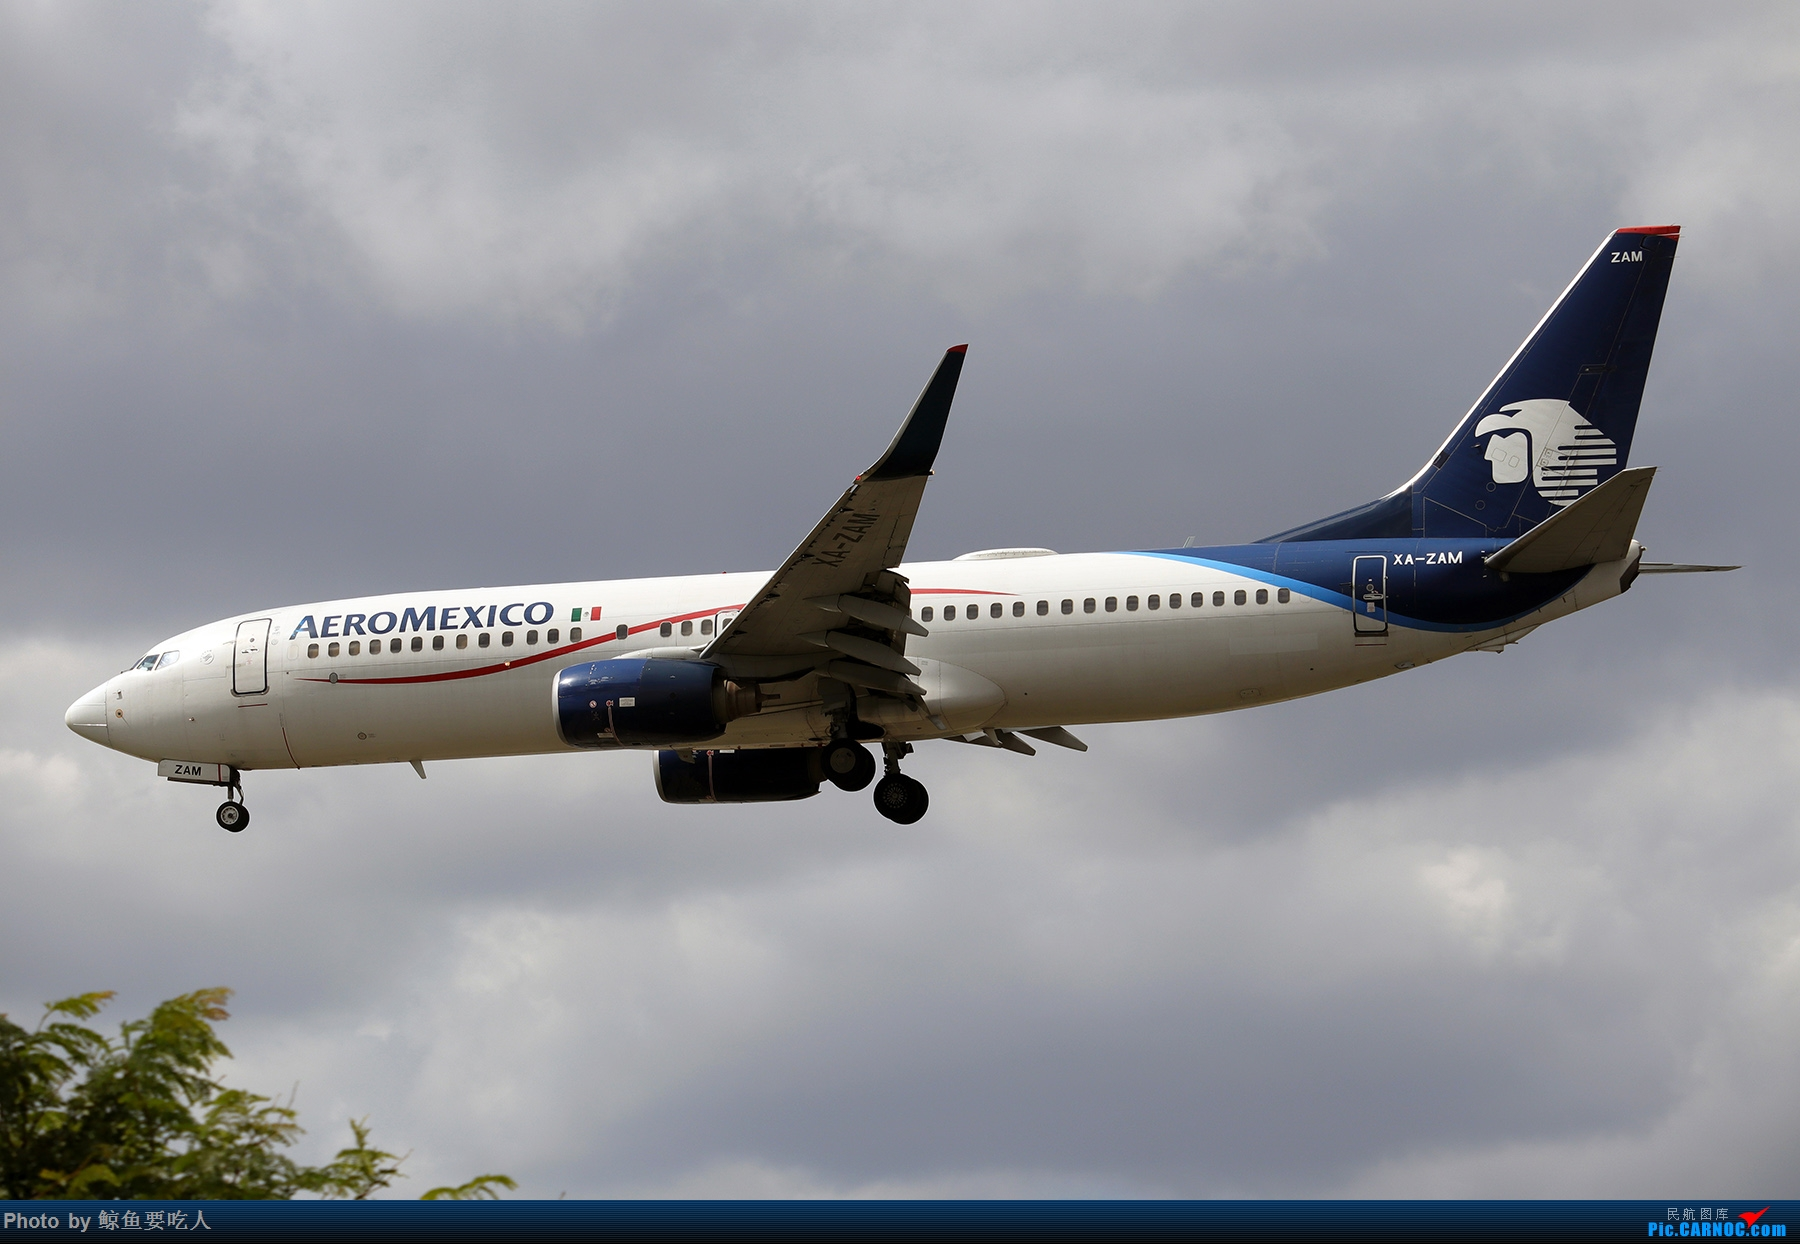 Re:[原创]【多图党】见证疫情后逐步的恢复,加拿大夏日多伦多皮尔逊机场拍机~ 乐见诸航空公司复航多伦多 BOEING 737-800 XA-ZAM 多伦多皮尔逊国际机场